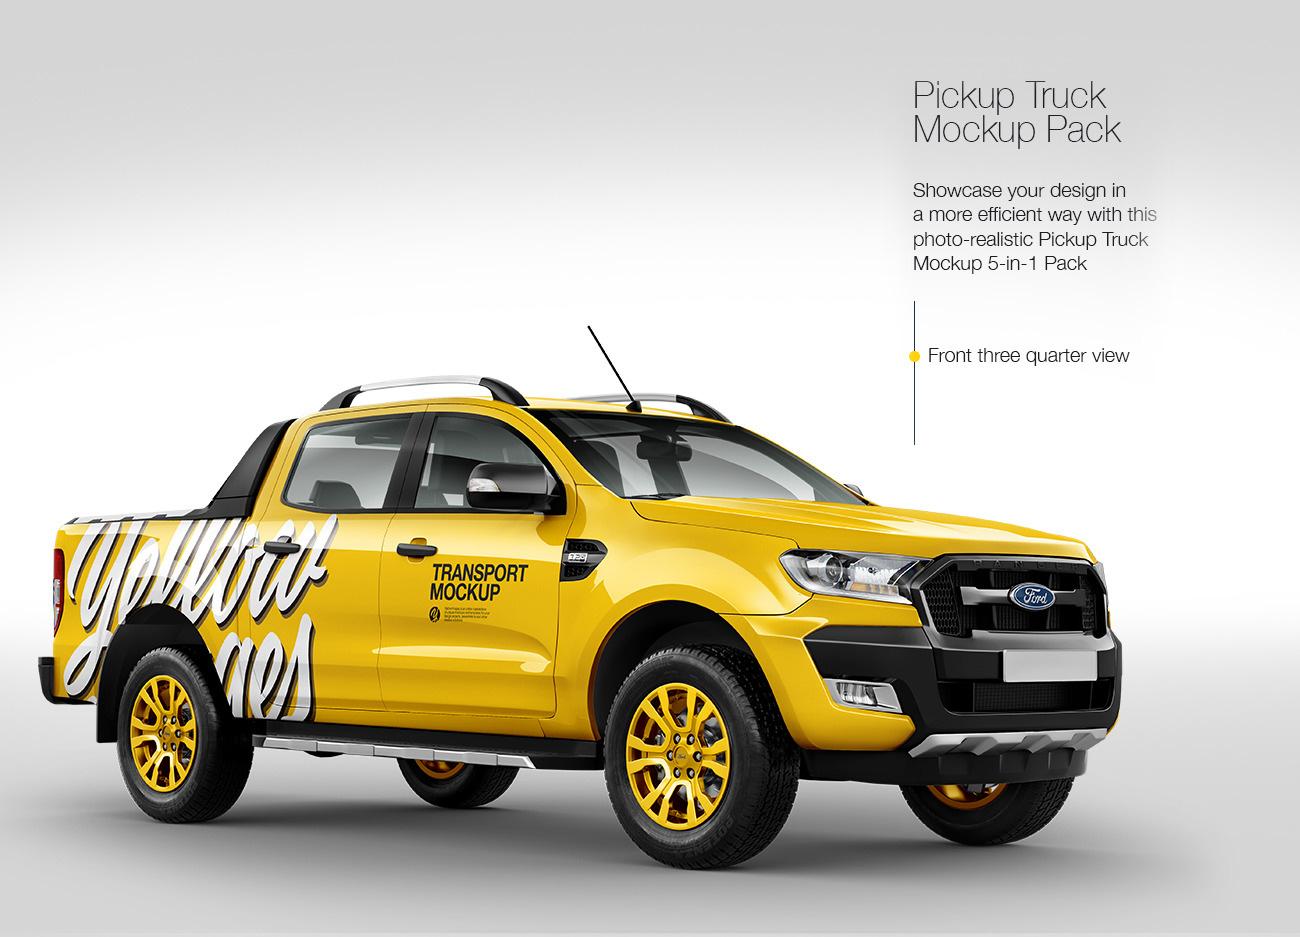 Pickup Truck Mockup Pack: 5-in-1 Pack